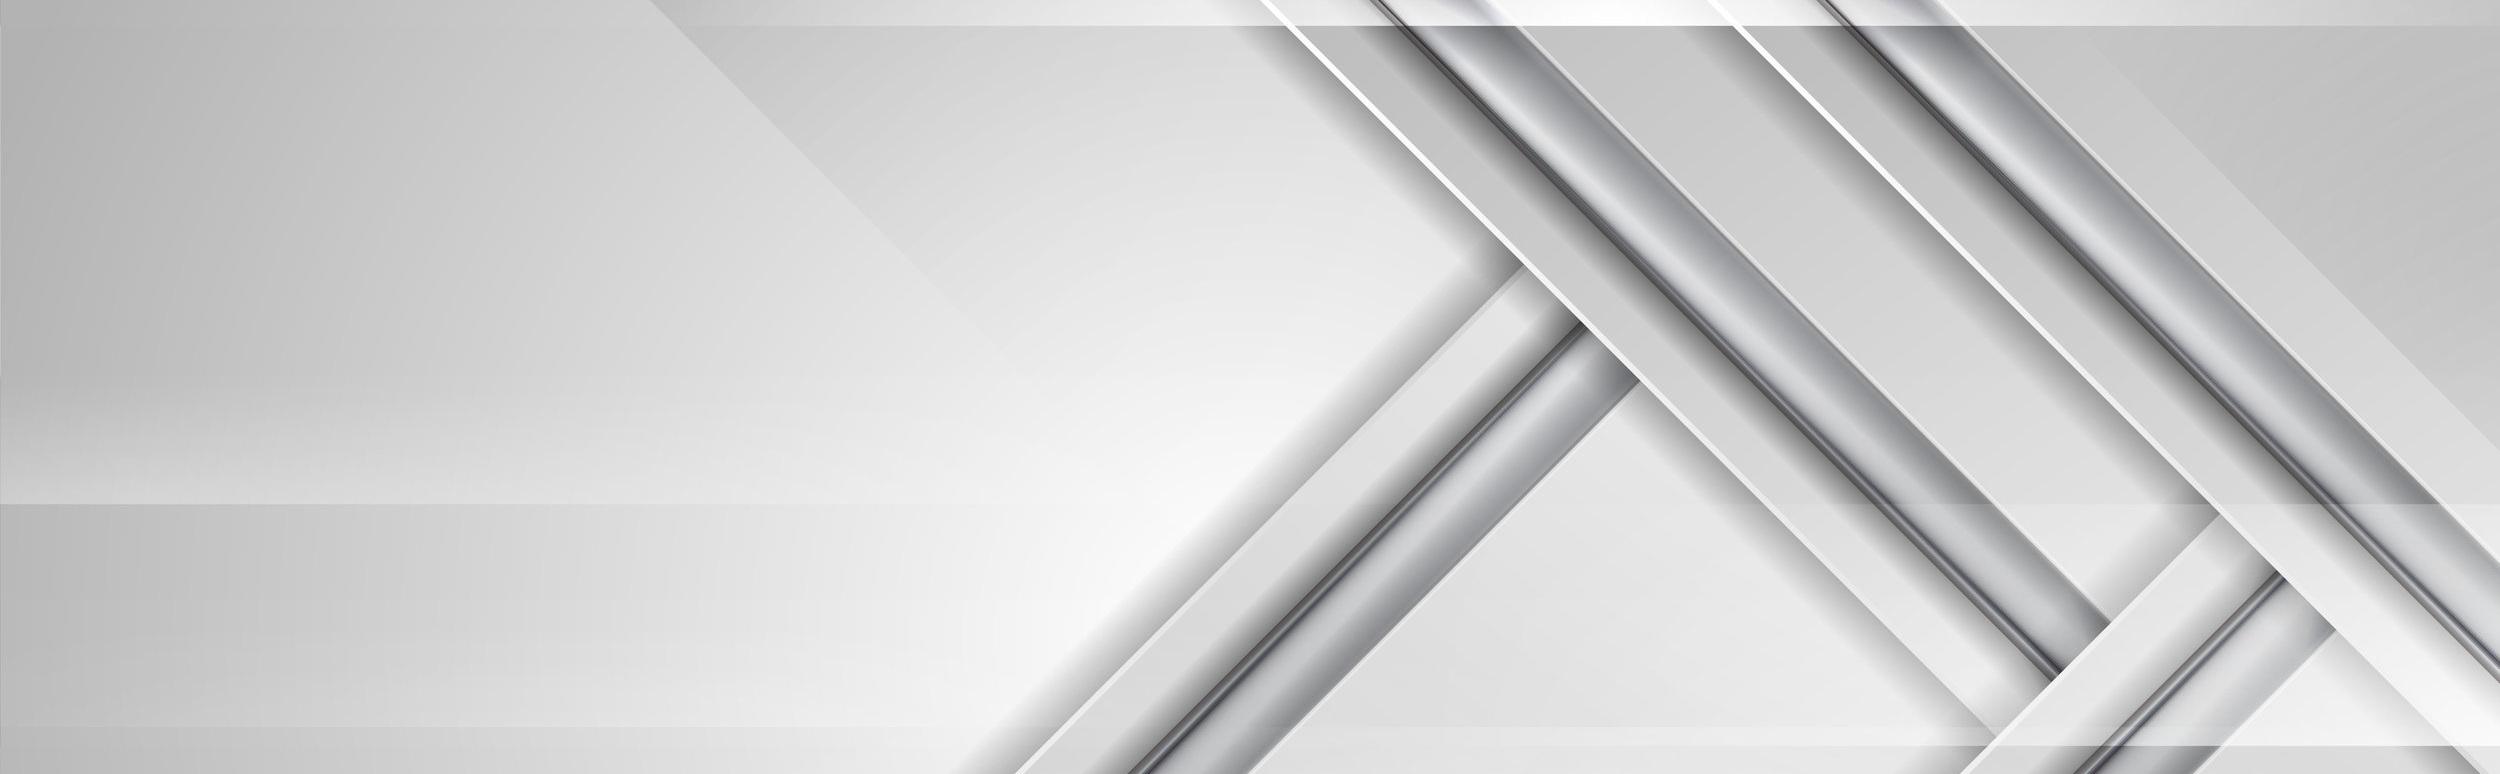 284-12-grey-silver-stripes-corp-tech-notext.jpg